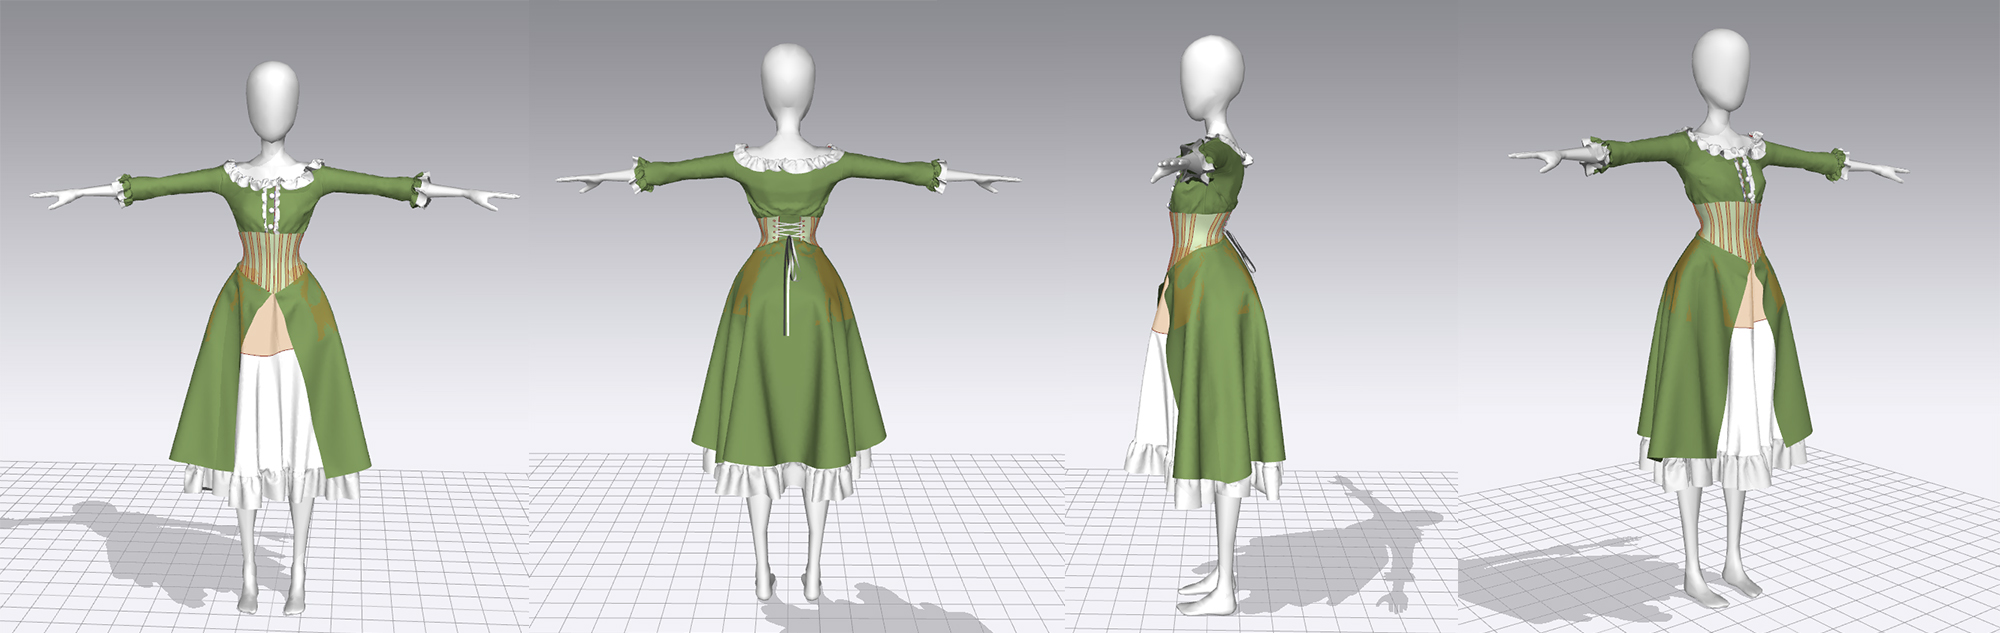 dress_MD.jpg